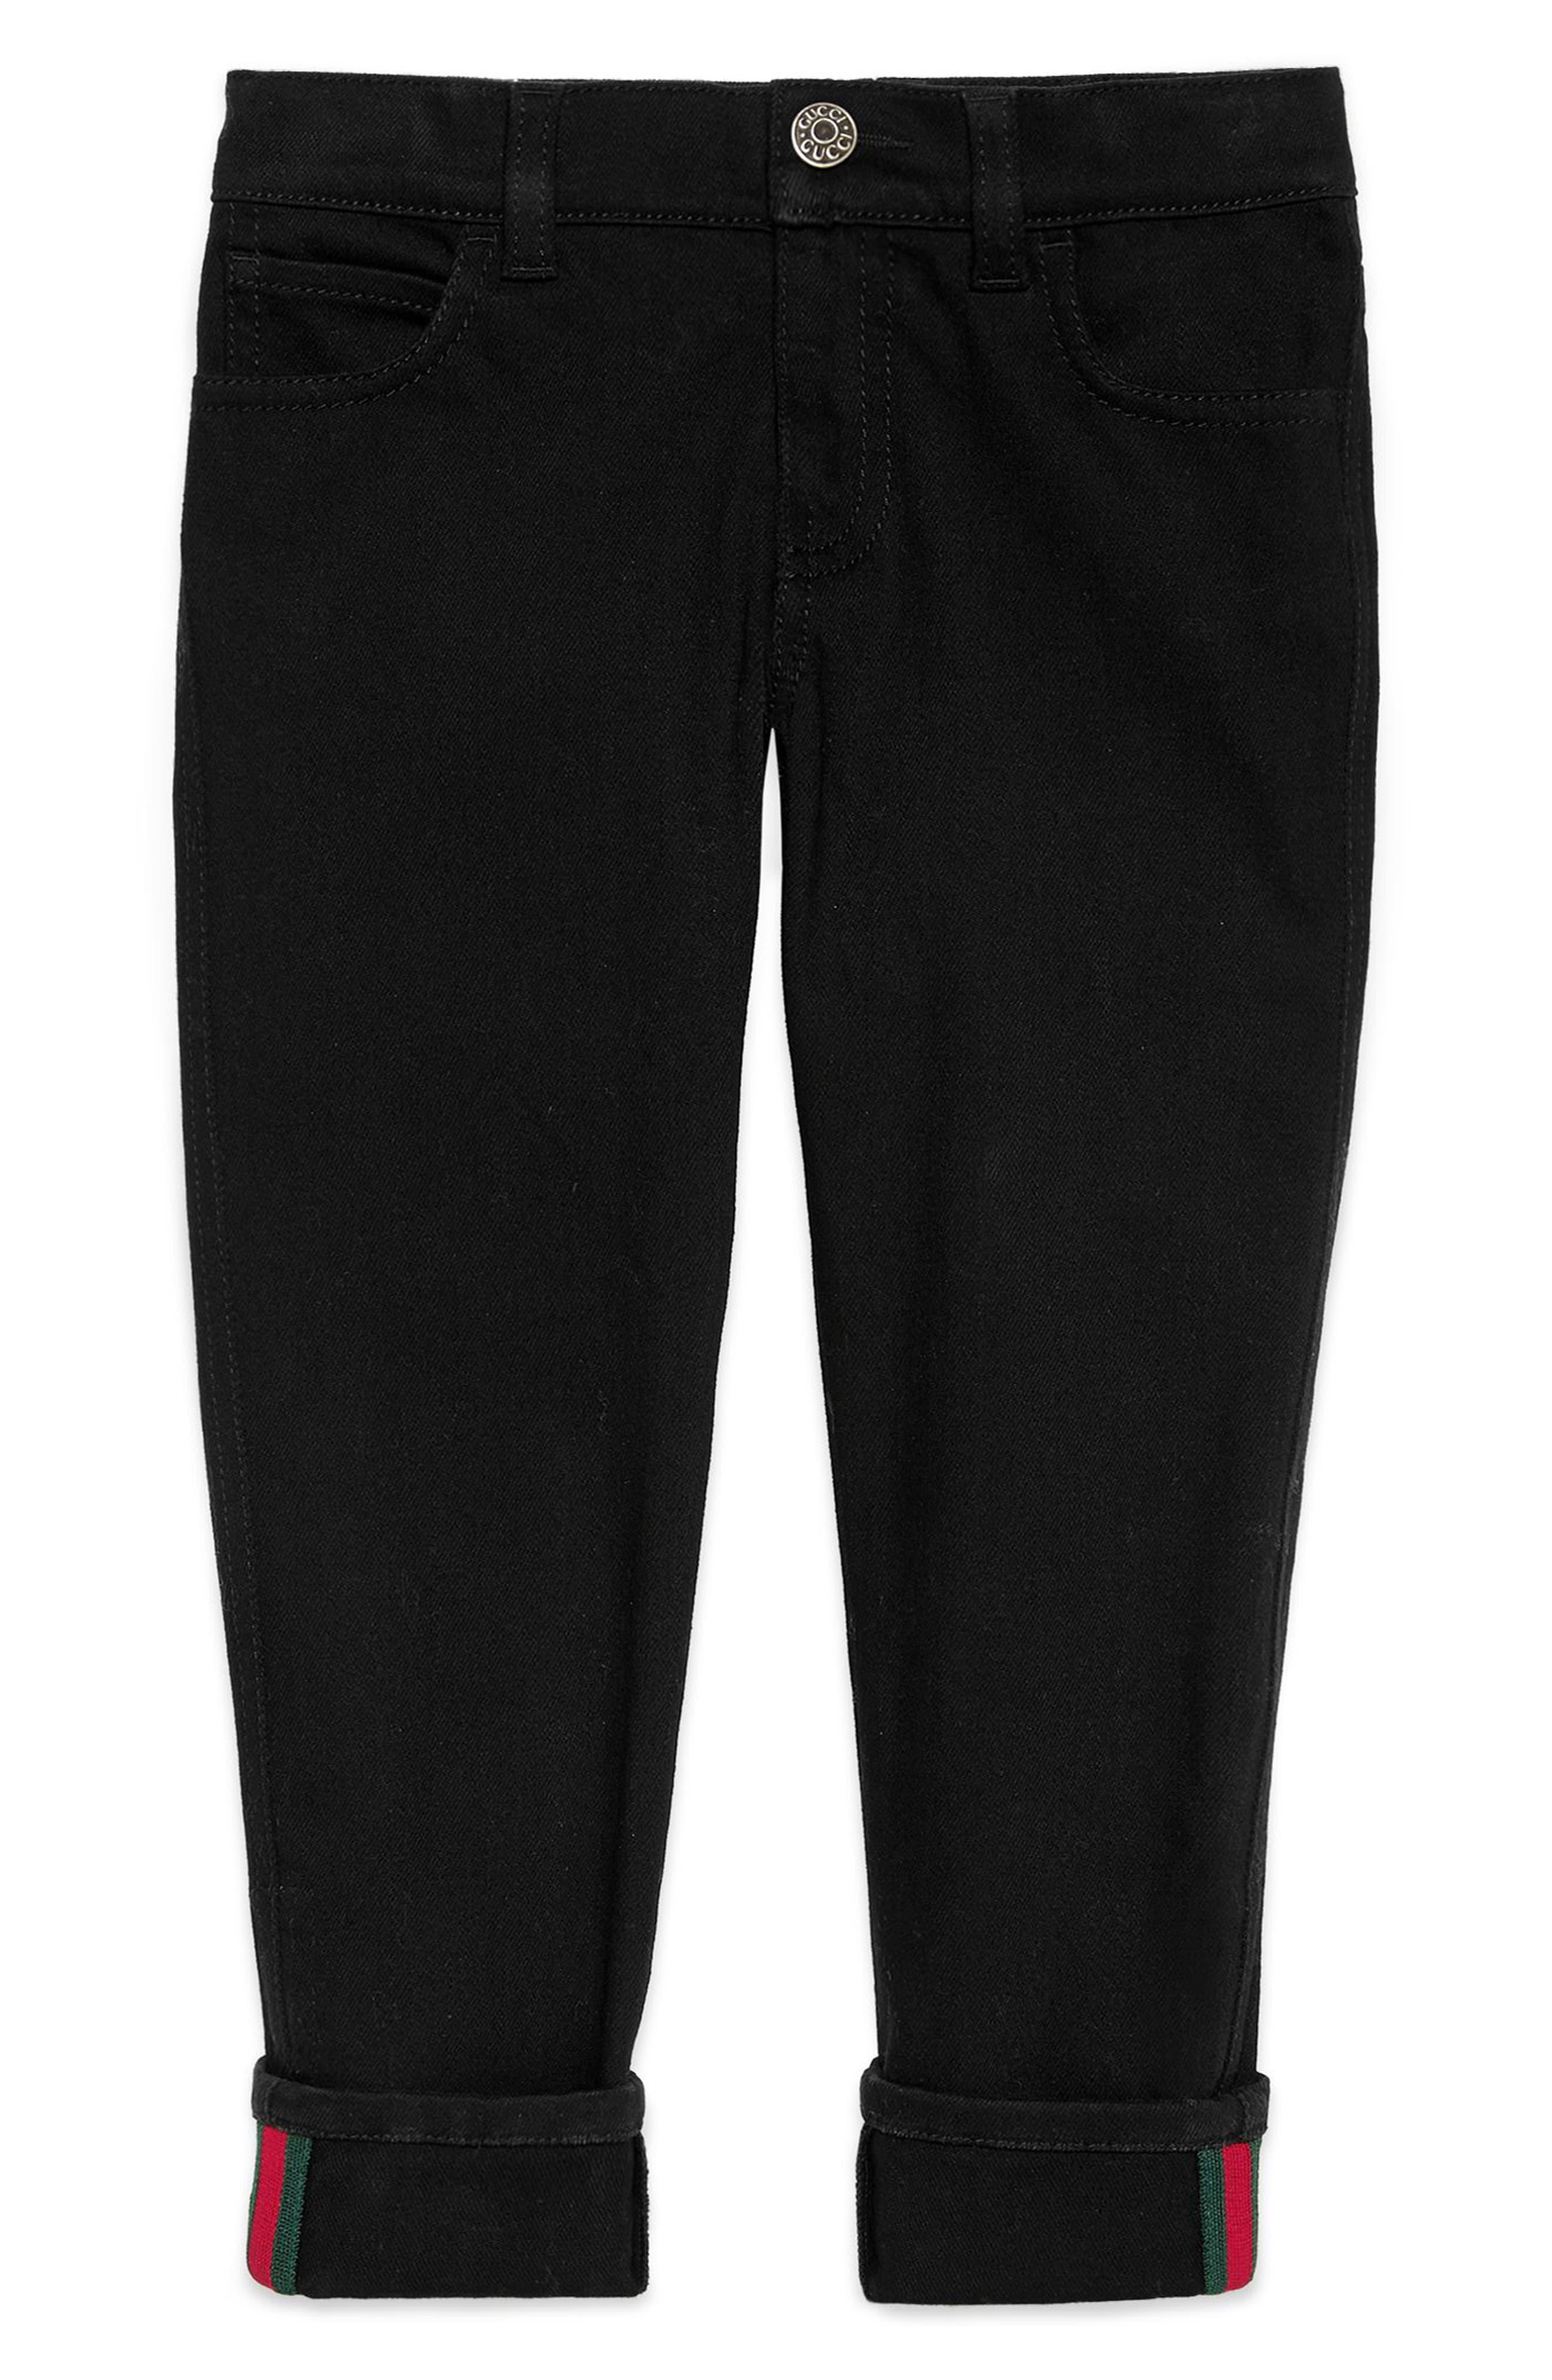 Boys Gucci Straight Leg Pants Size 12Y  Black